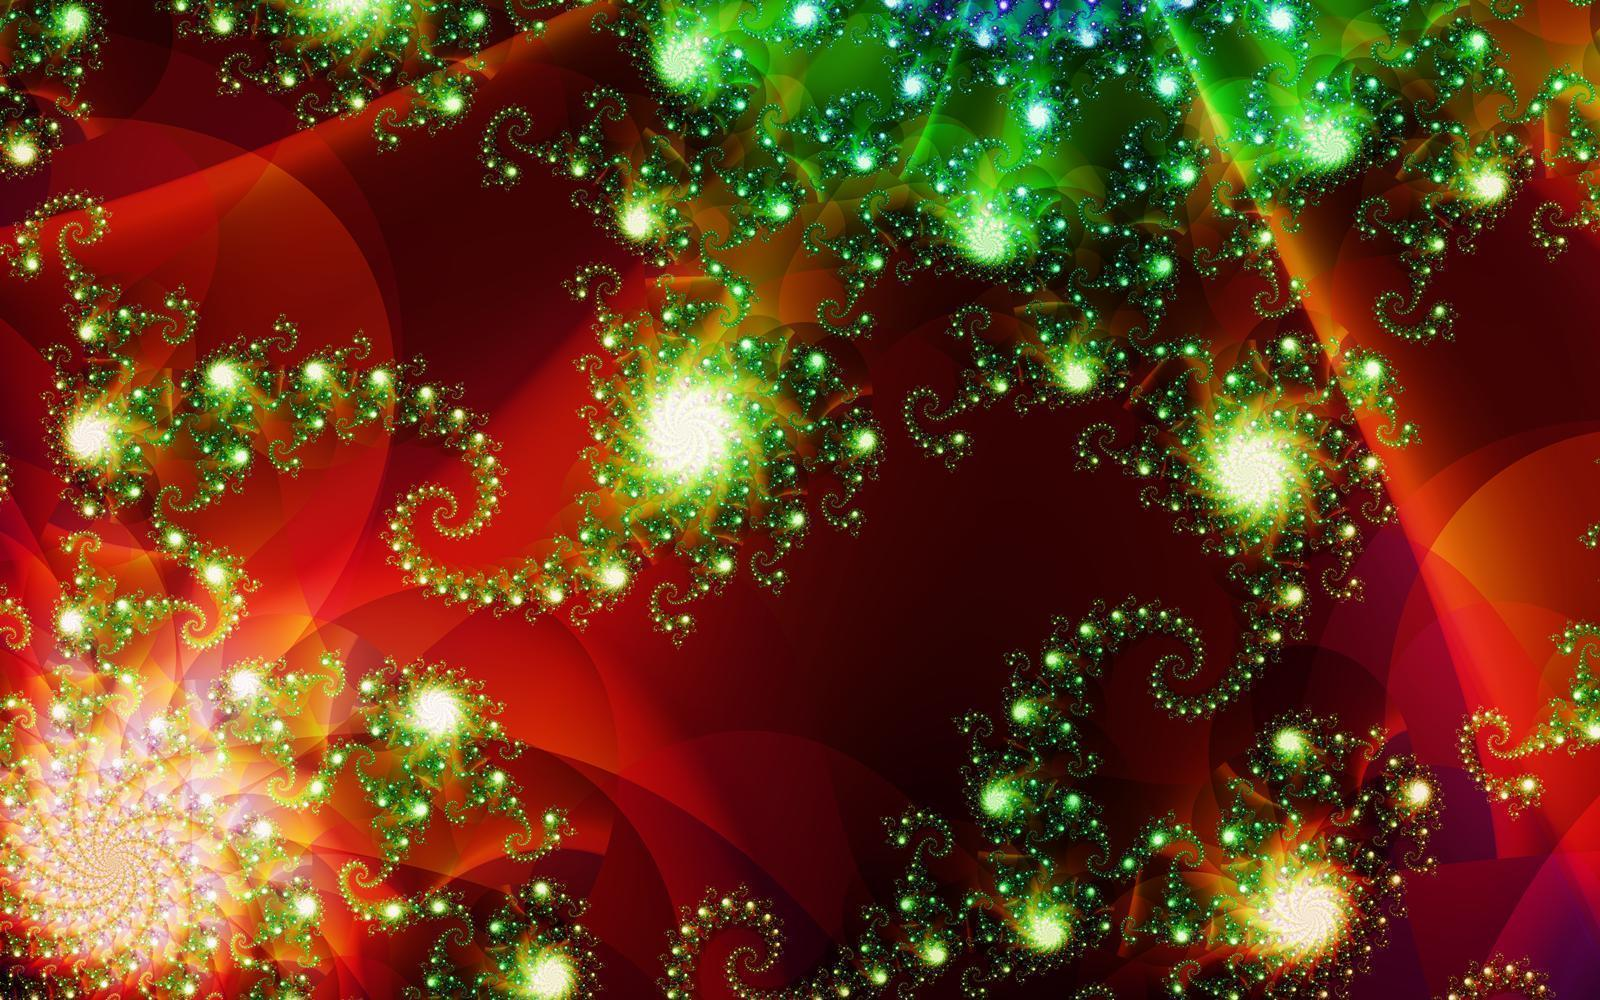 Christmas Lights Desktop Wallpapers